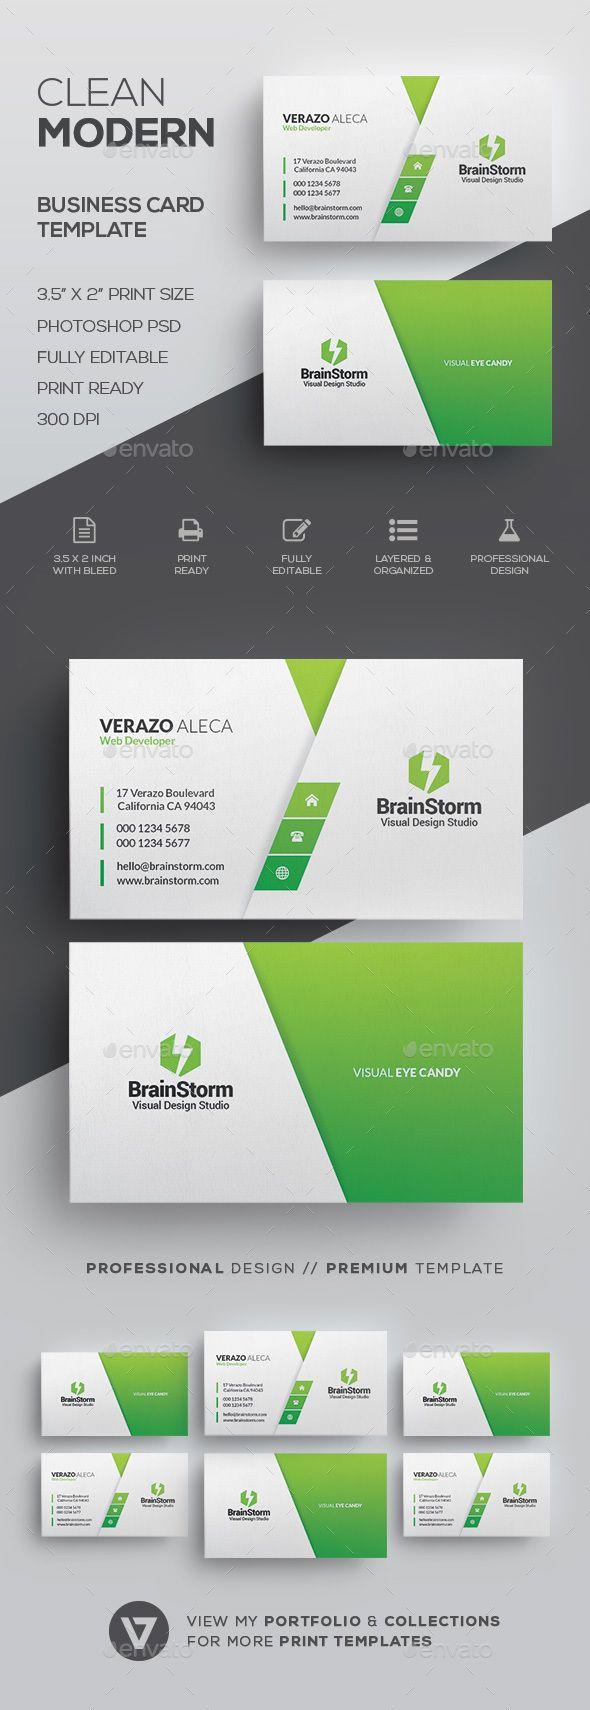 Clean modern business card template cartes de visita visita e carto clean modern business card template reheart Gallery